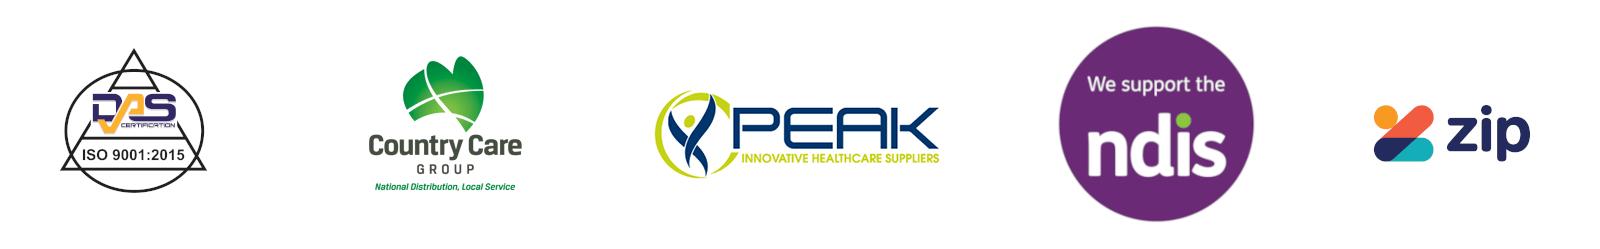 DAS Country Care Group Peak Care NDIS